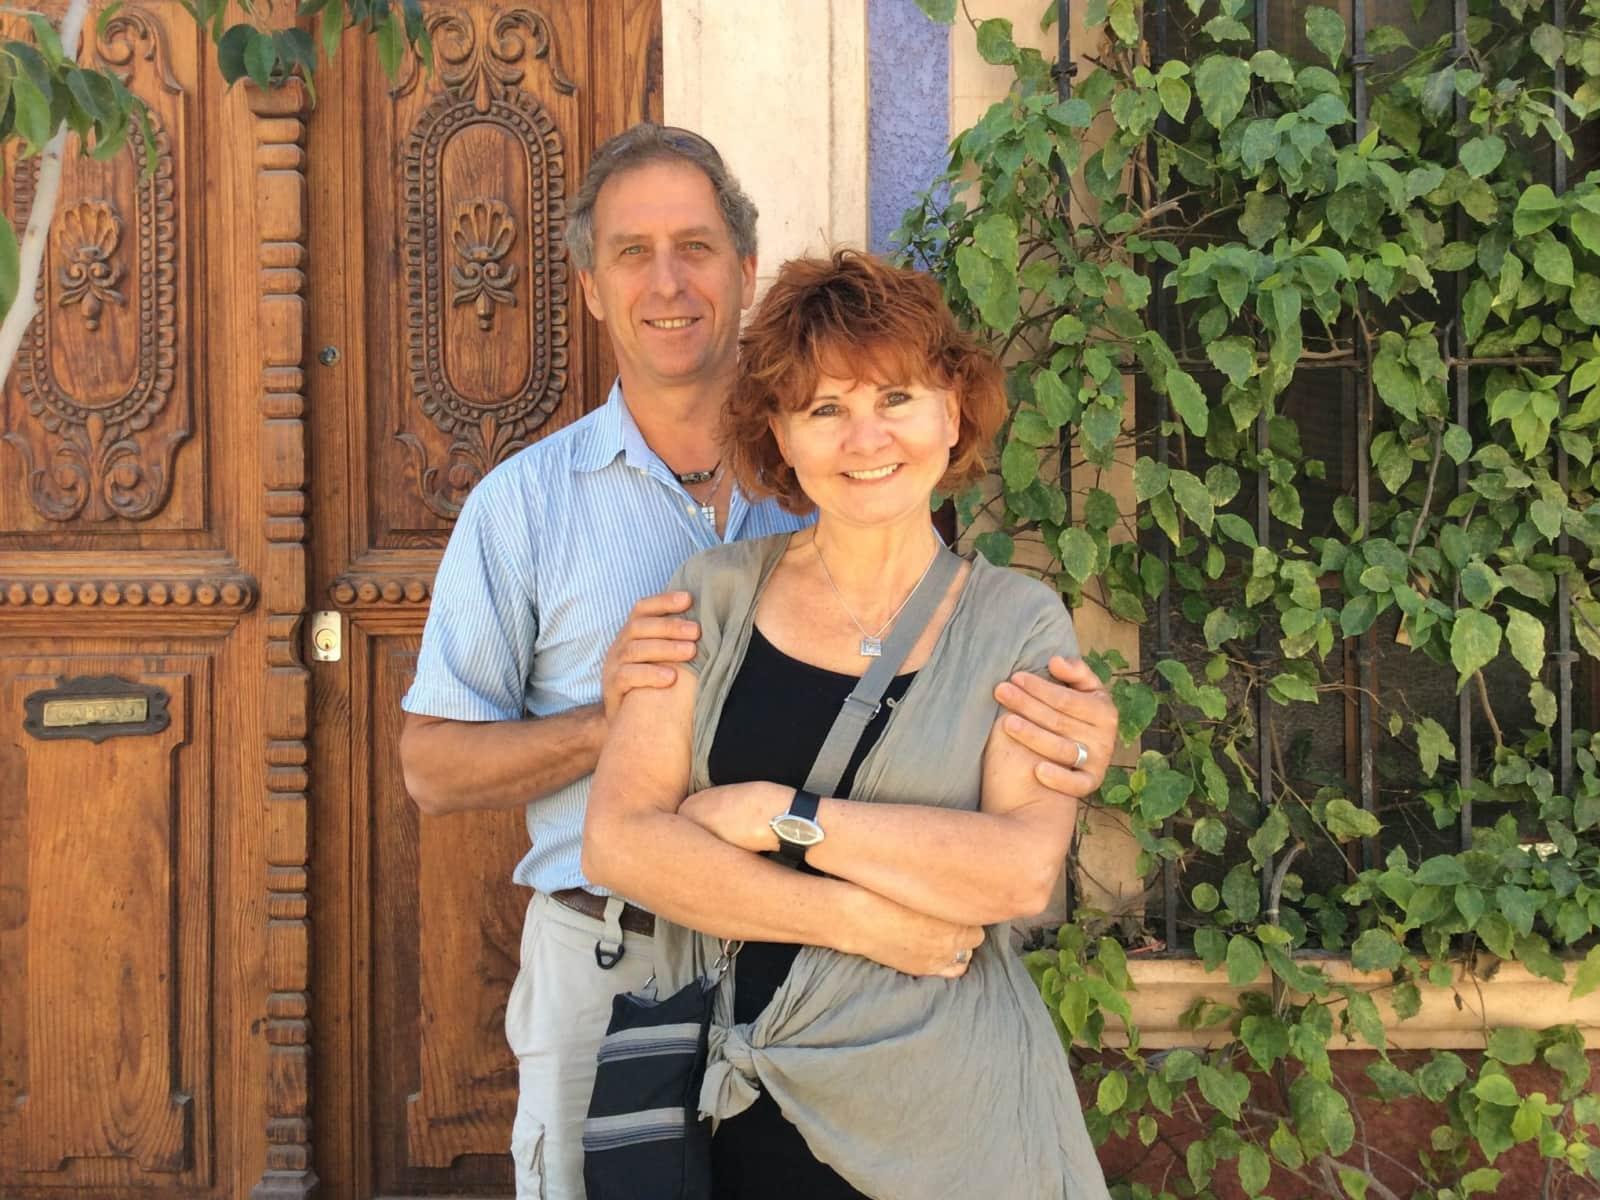 Paul & Faye from Bargara, Queensland, Australia